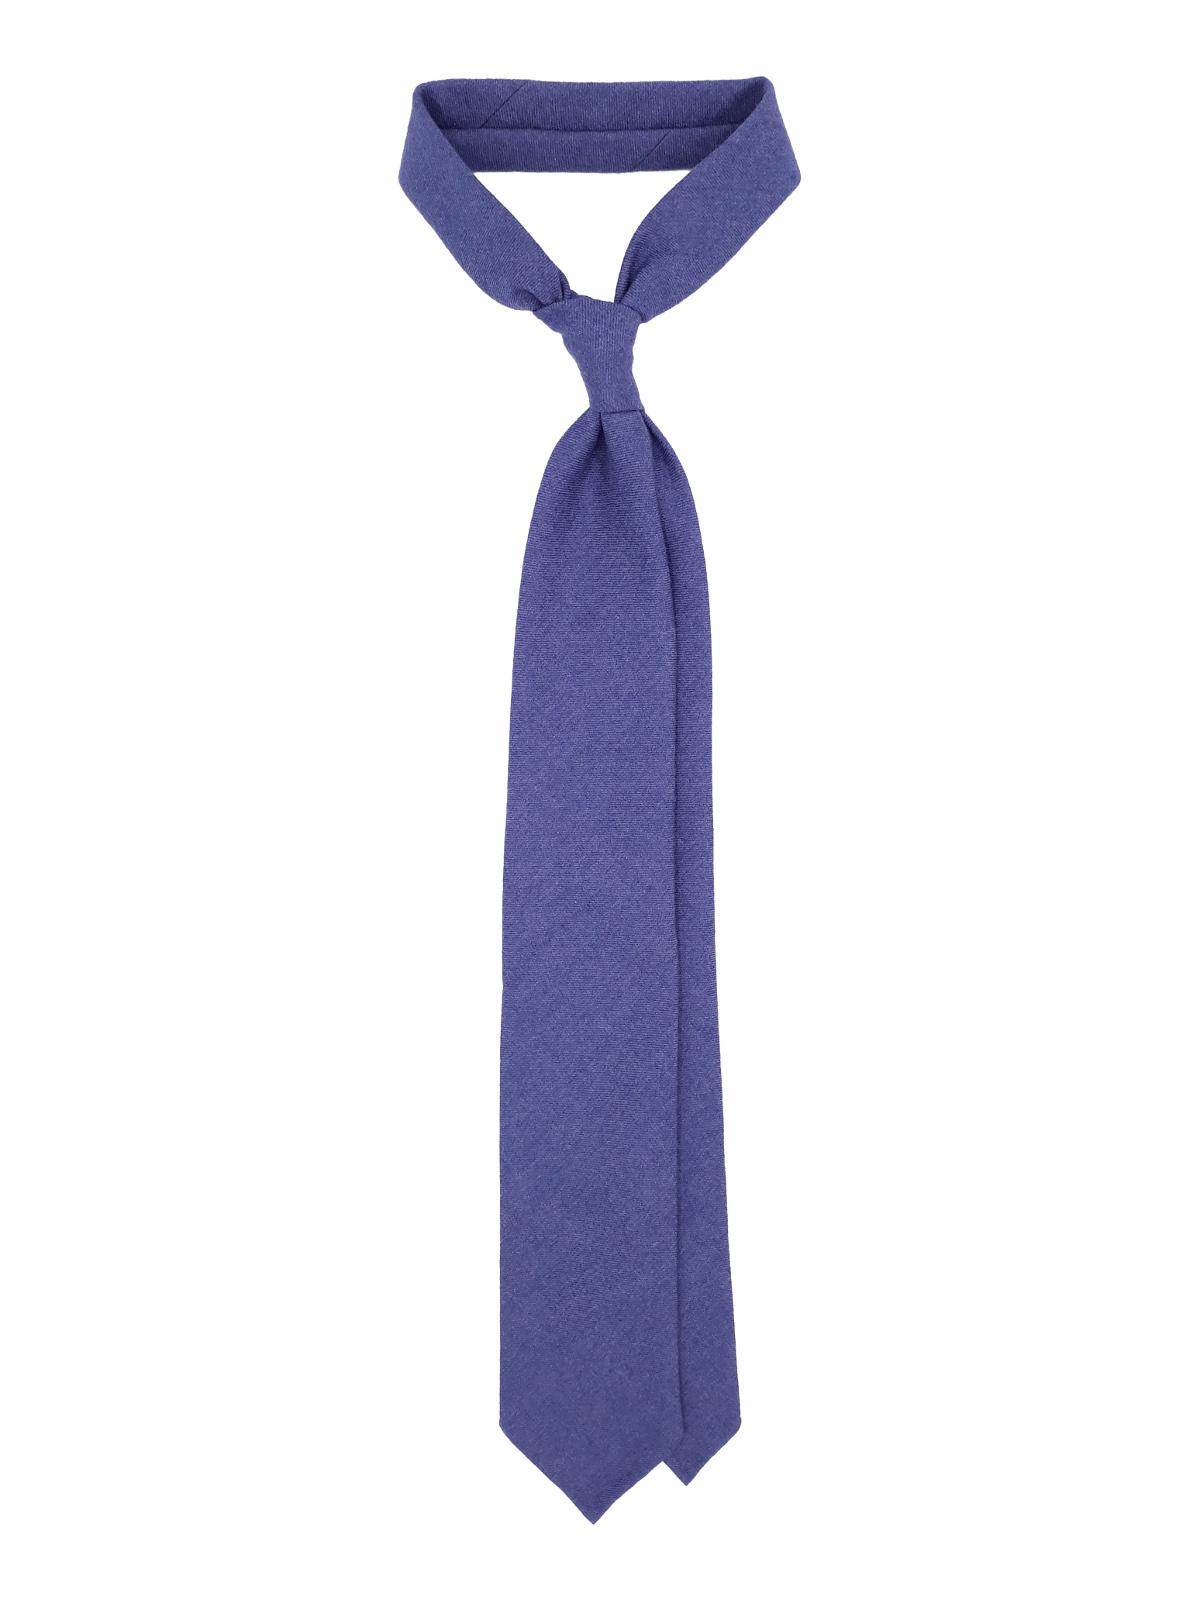 3 fold tie royal blue